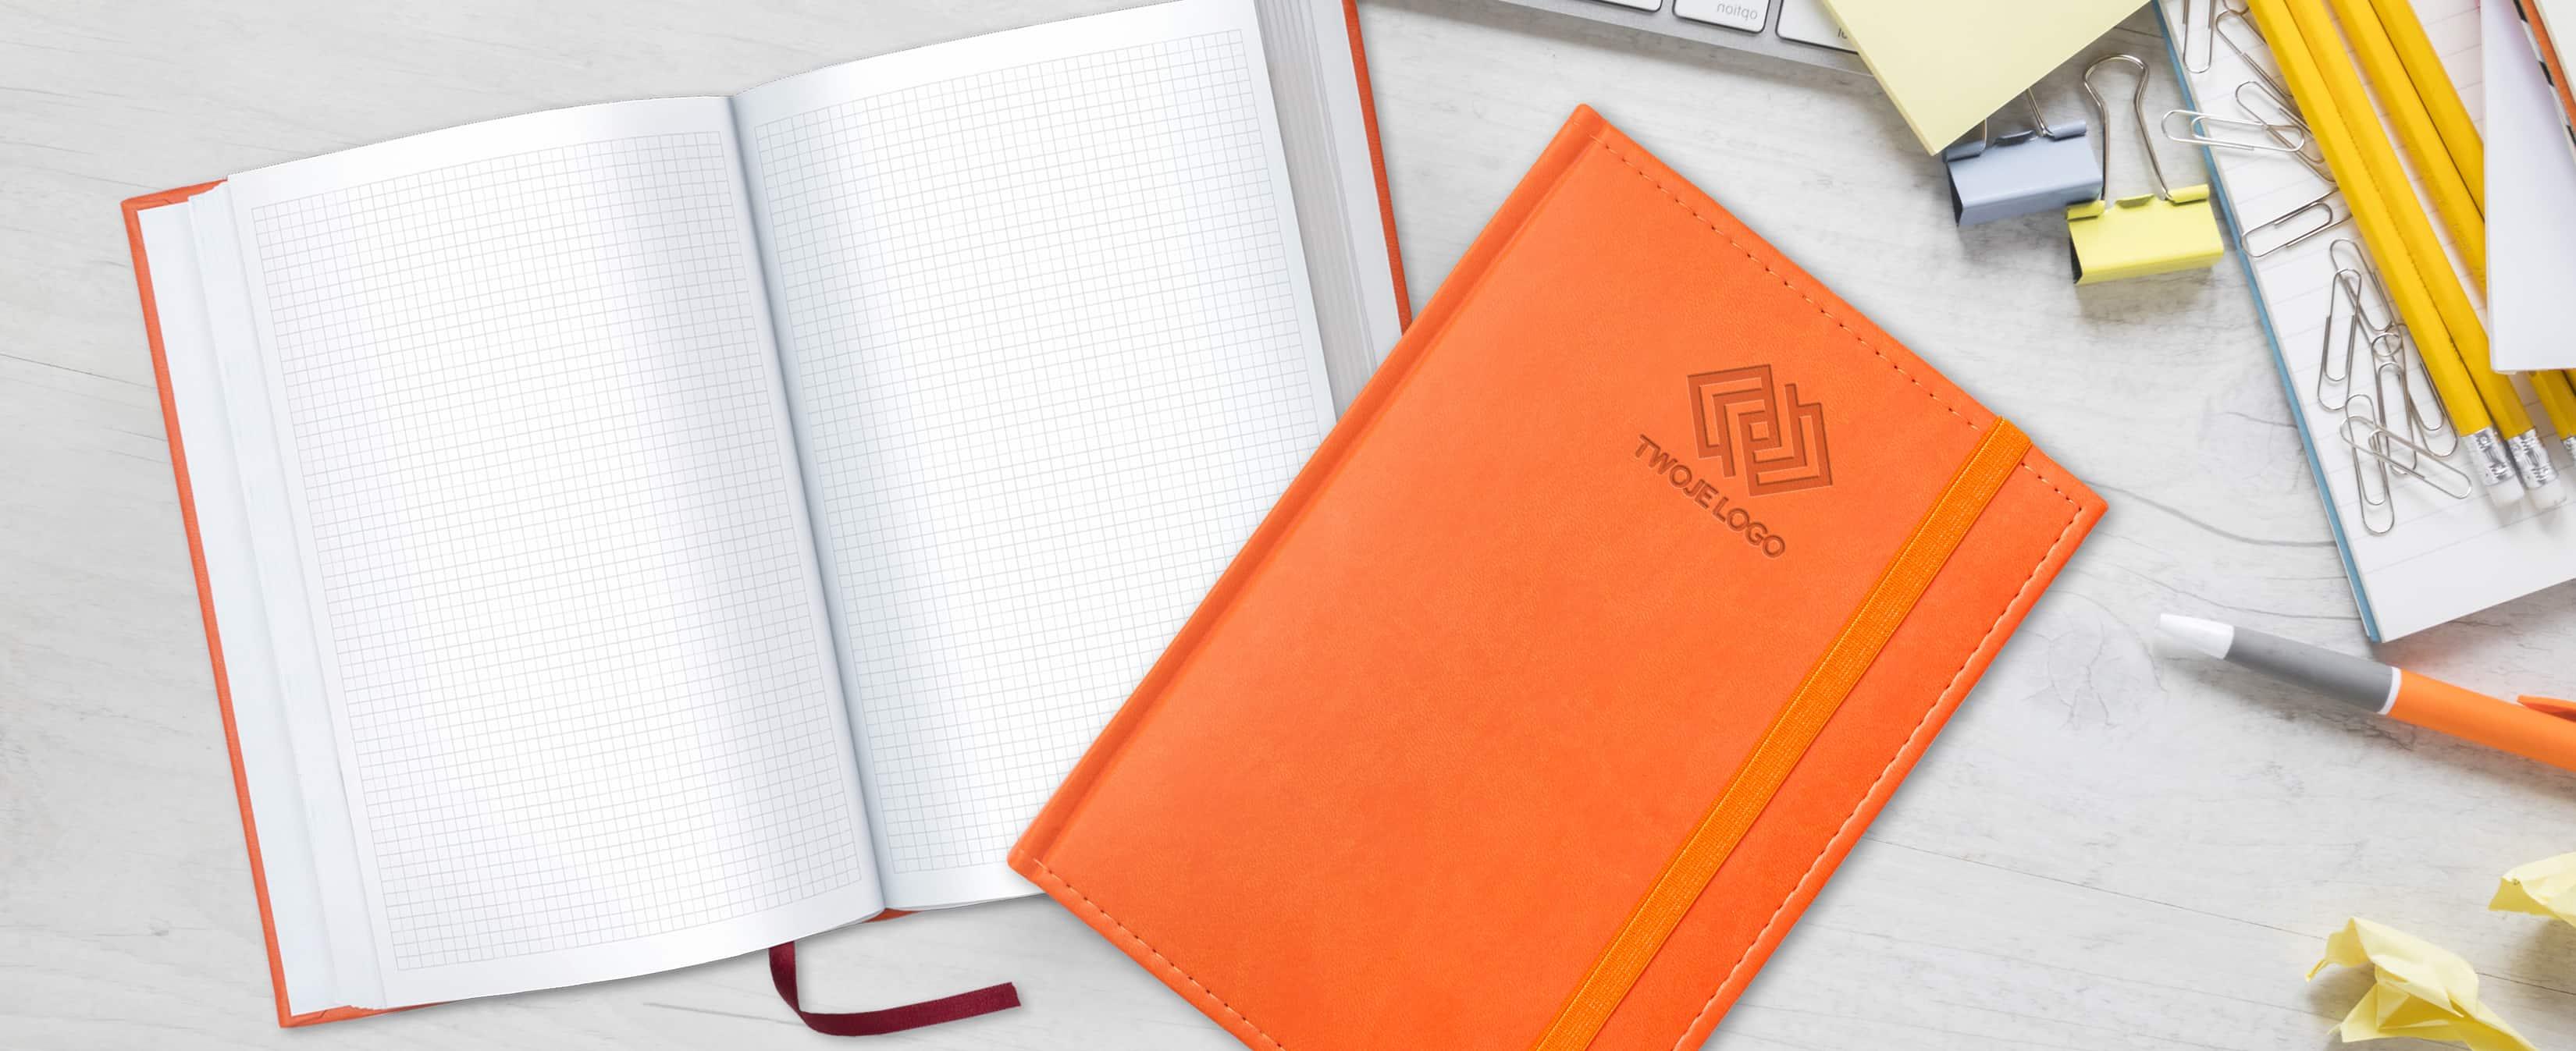 notesy książkowe z napisem Twoje logo